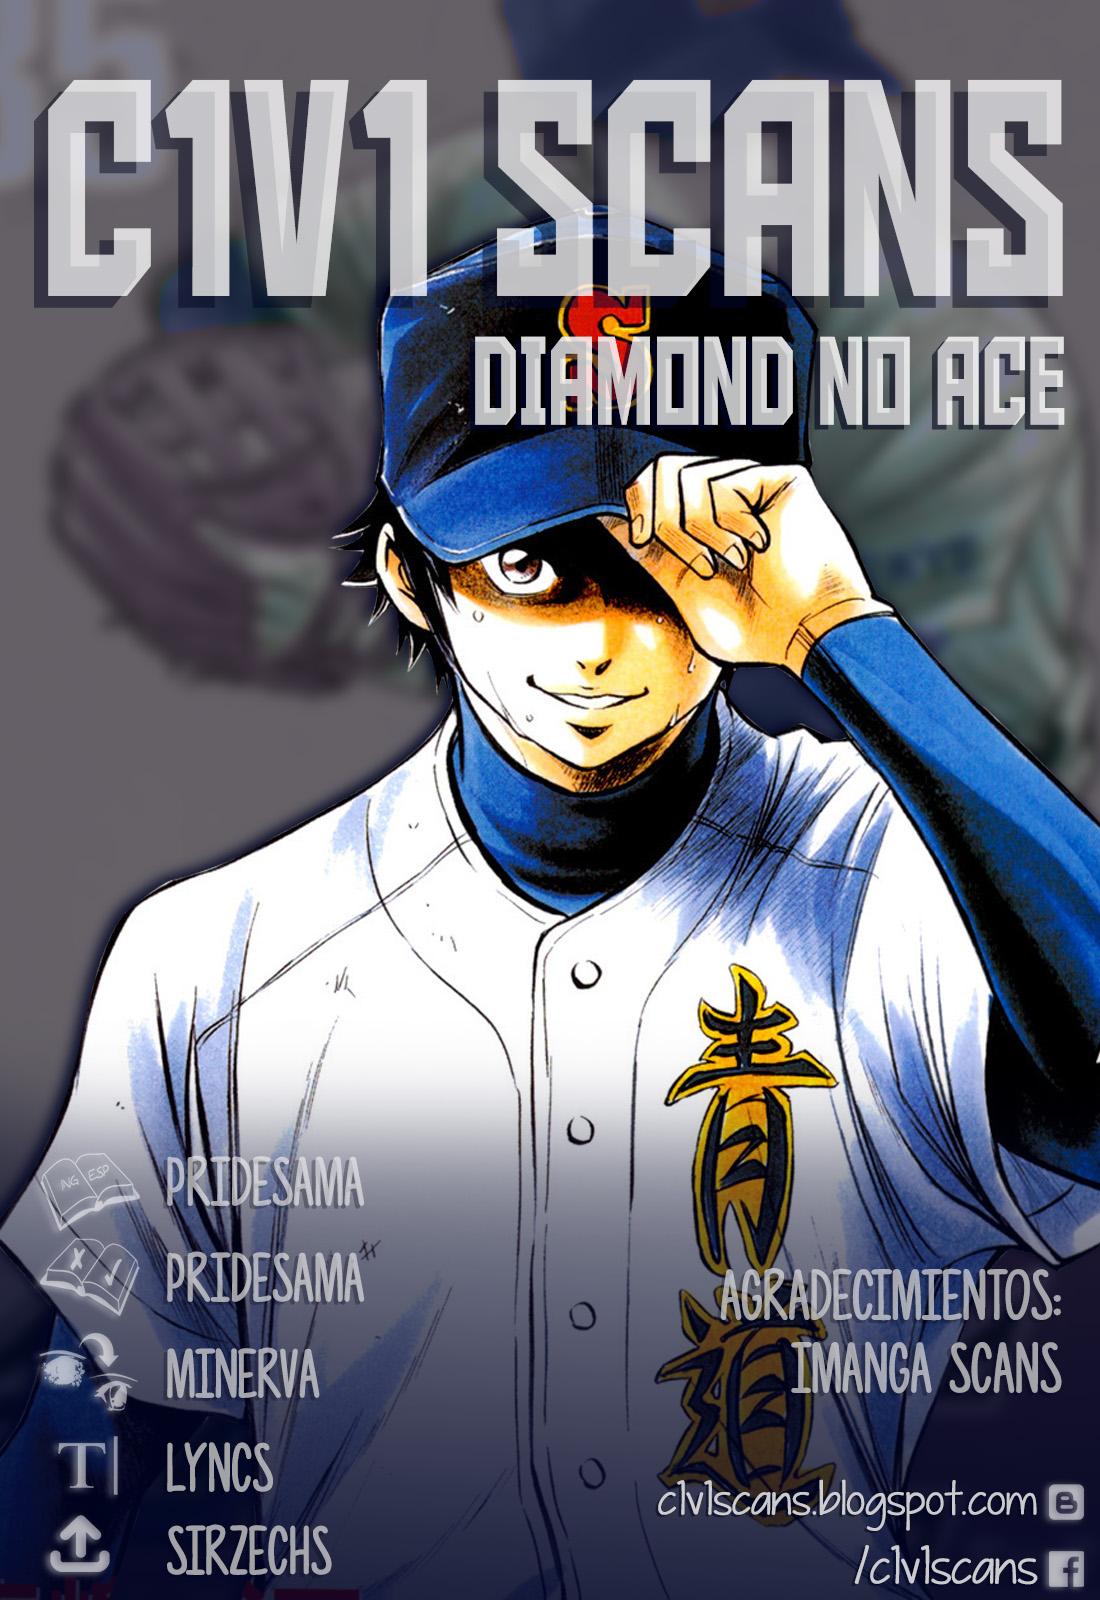 http://c5.ninemanga.com/es_manga/24/1752/448046/5954aab31b20ab1c654f77689fa95561.jpg Page 1